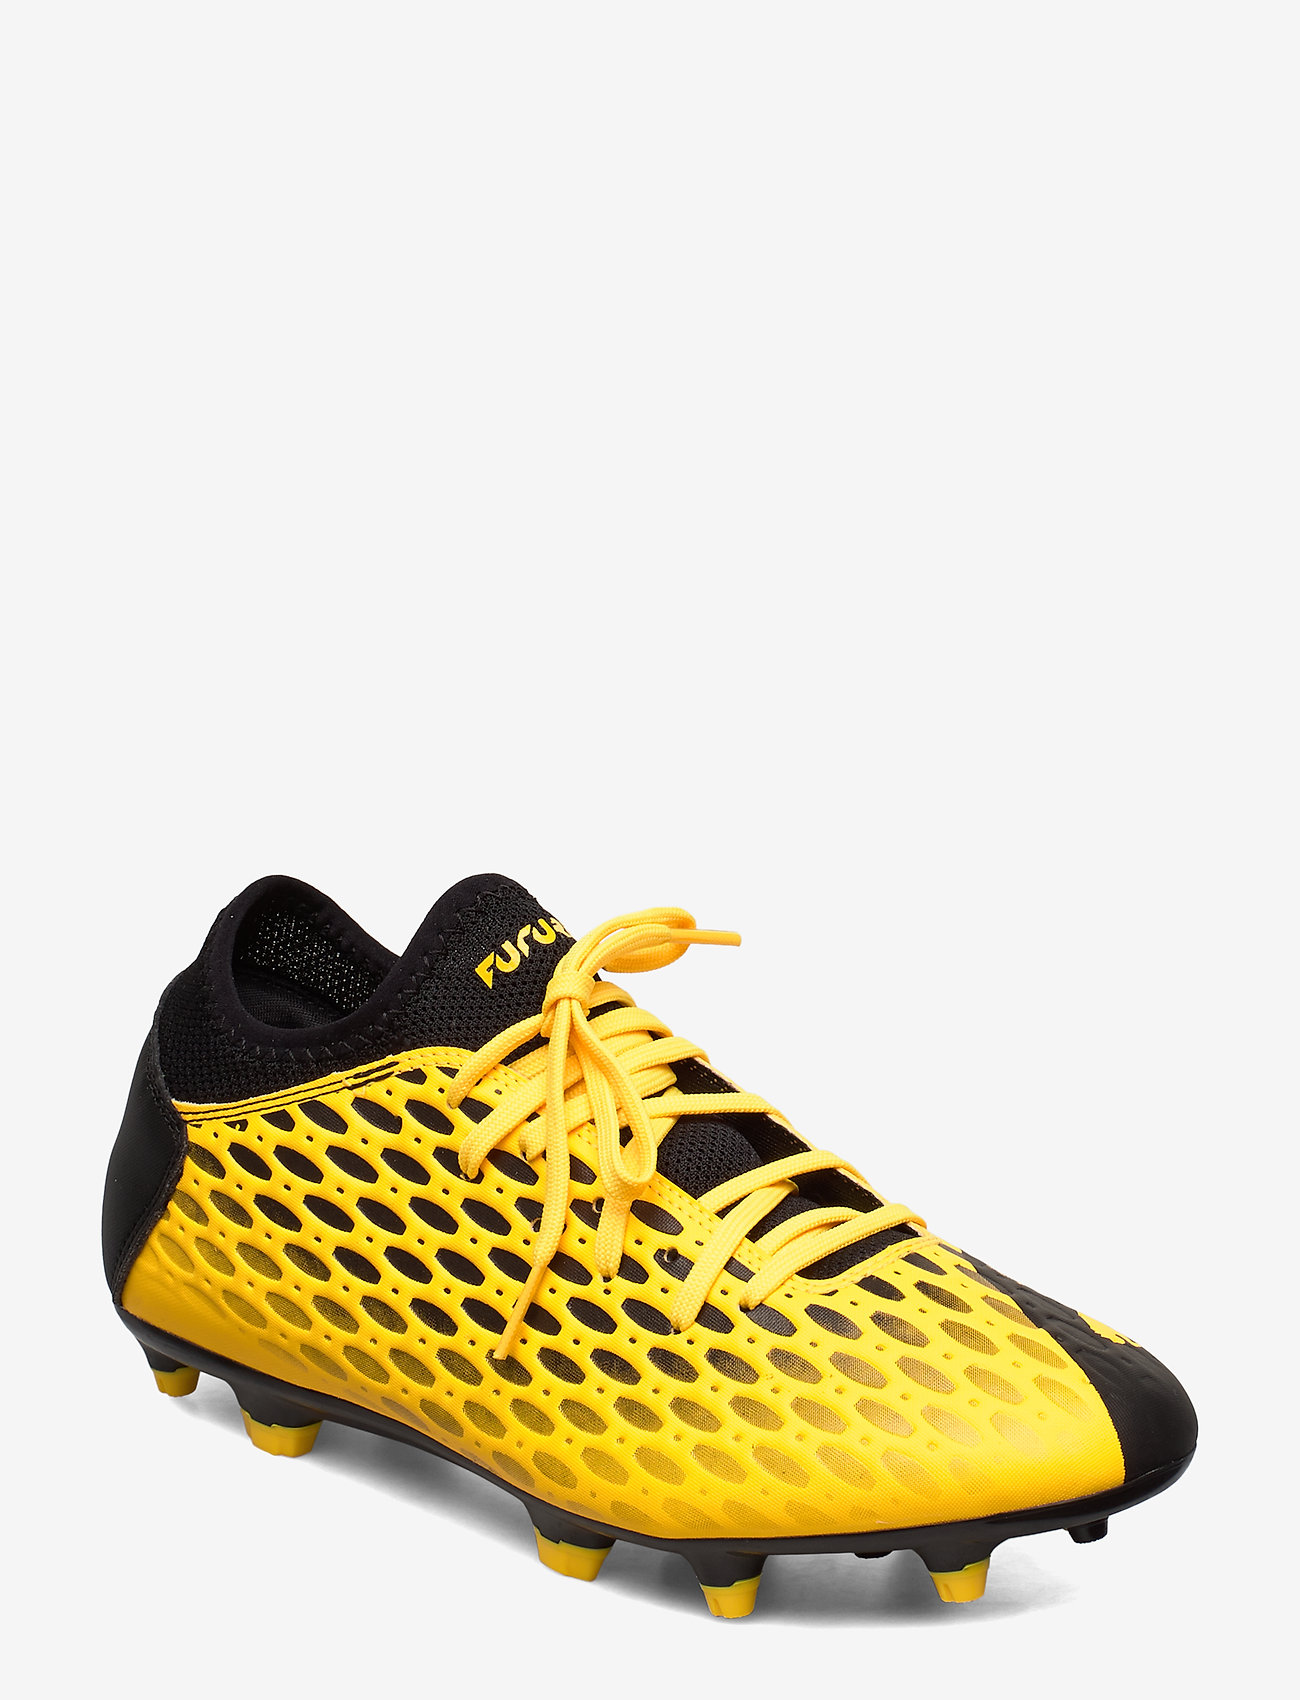 PUMA - FUTURE 5.4 FG/AG - jalkapallokengät - ultra yellow-puma black - 0